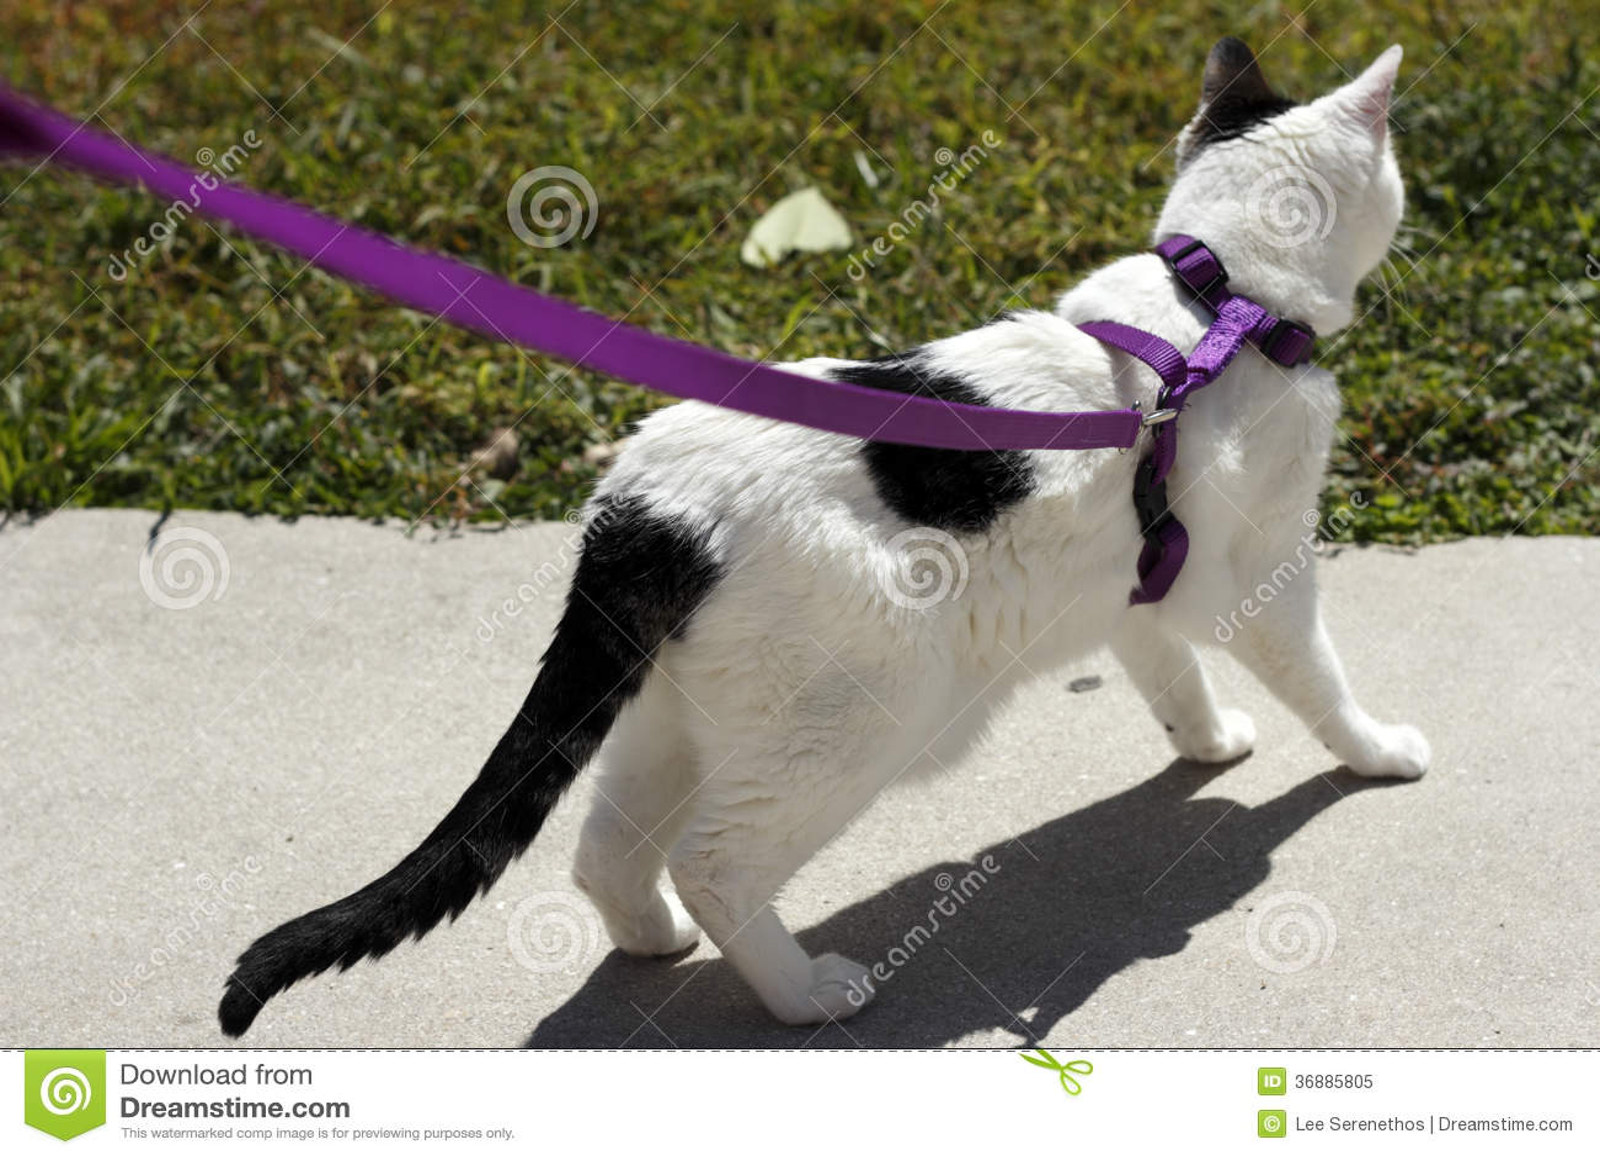 cheetoh cat breed